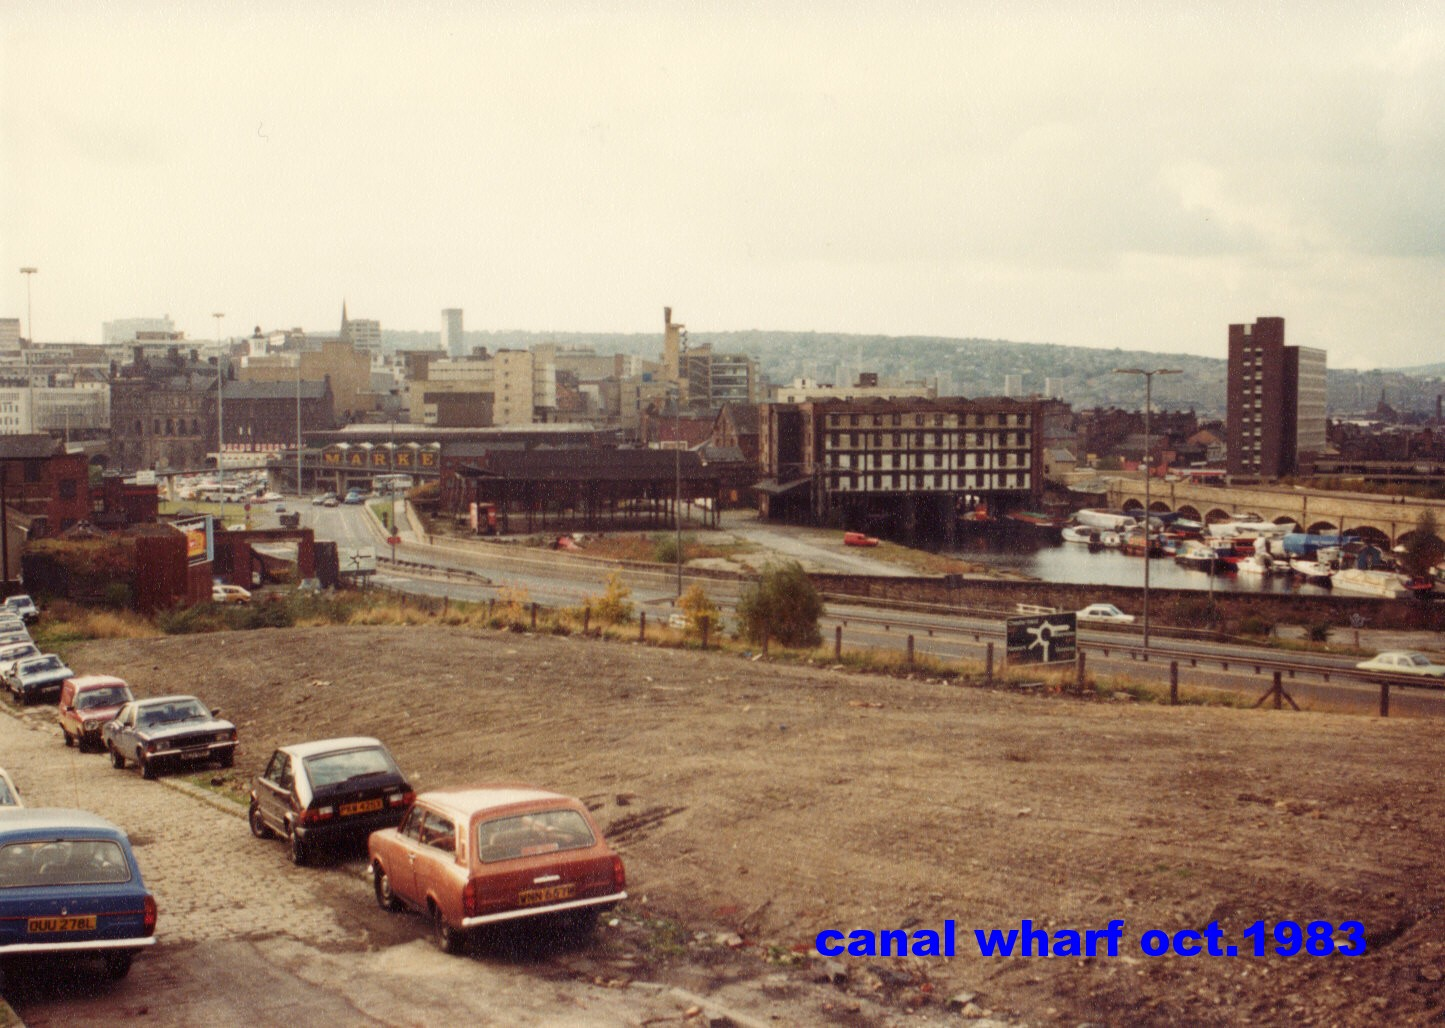 Canal Wharfe